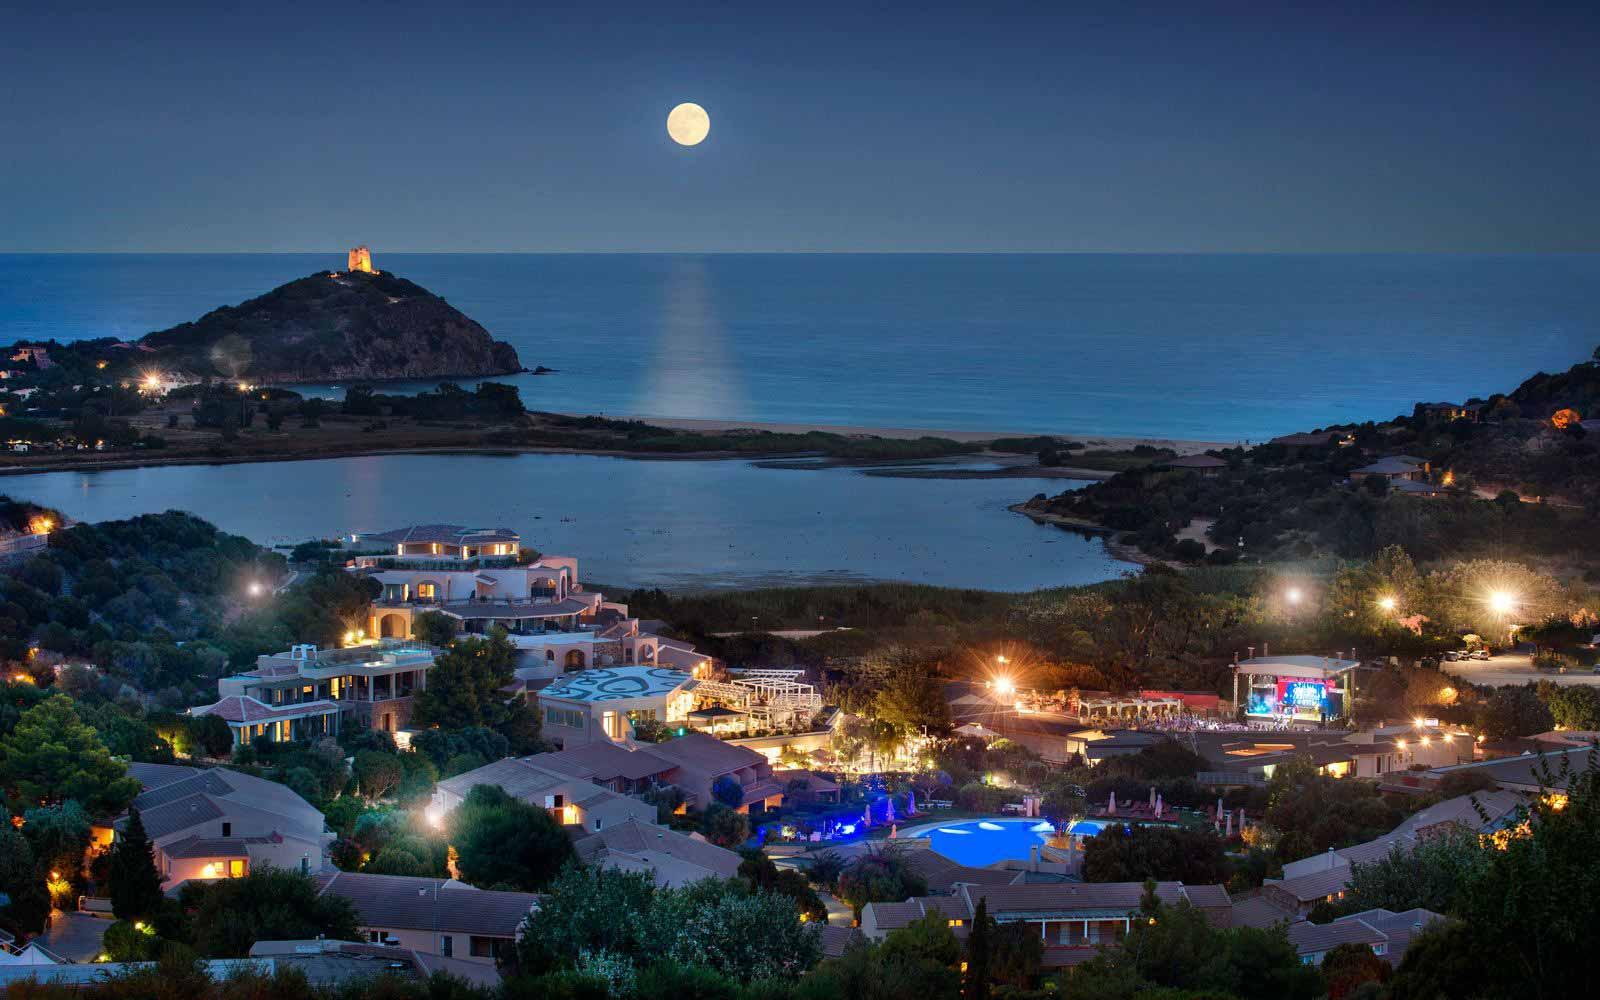 Chia Laguna Resort at night